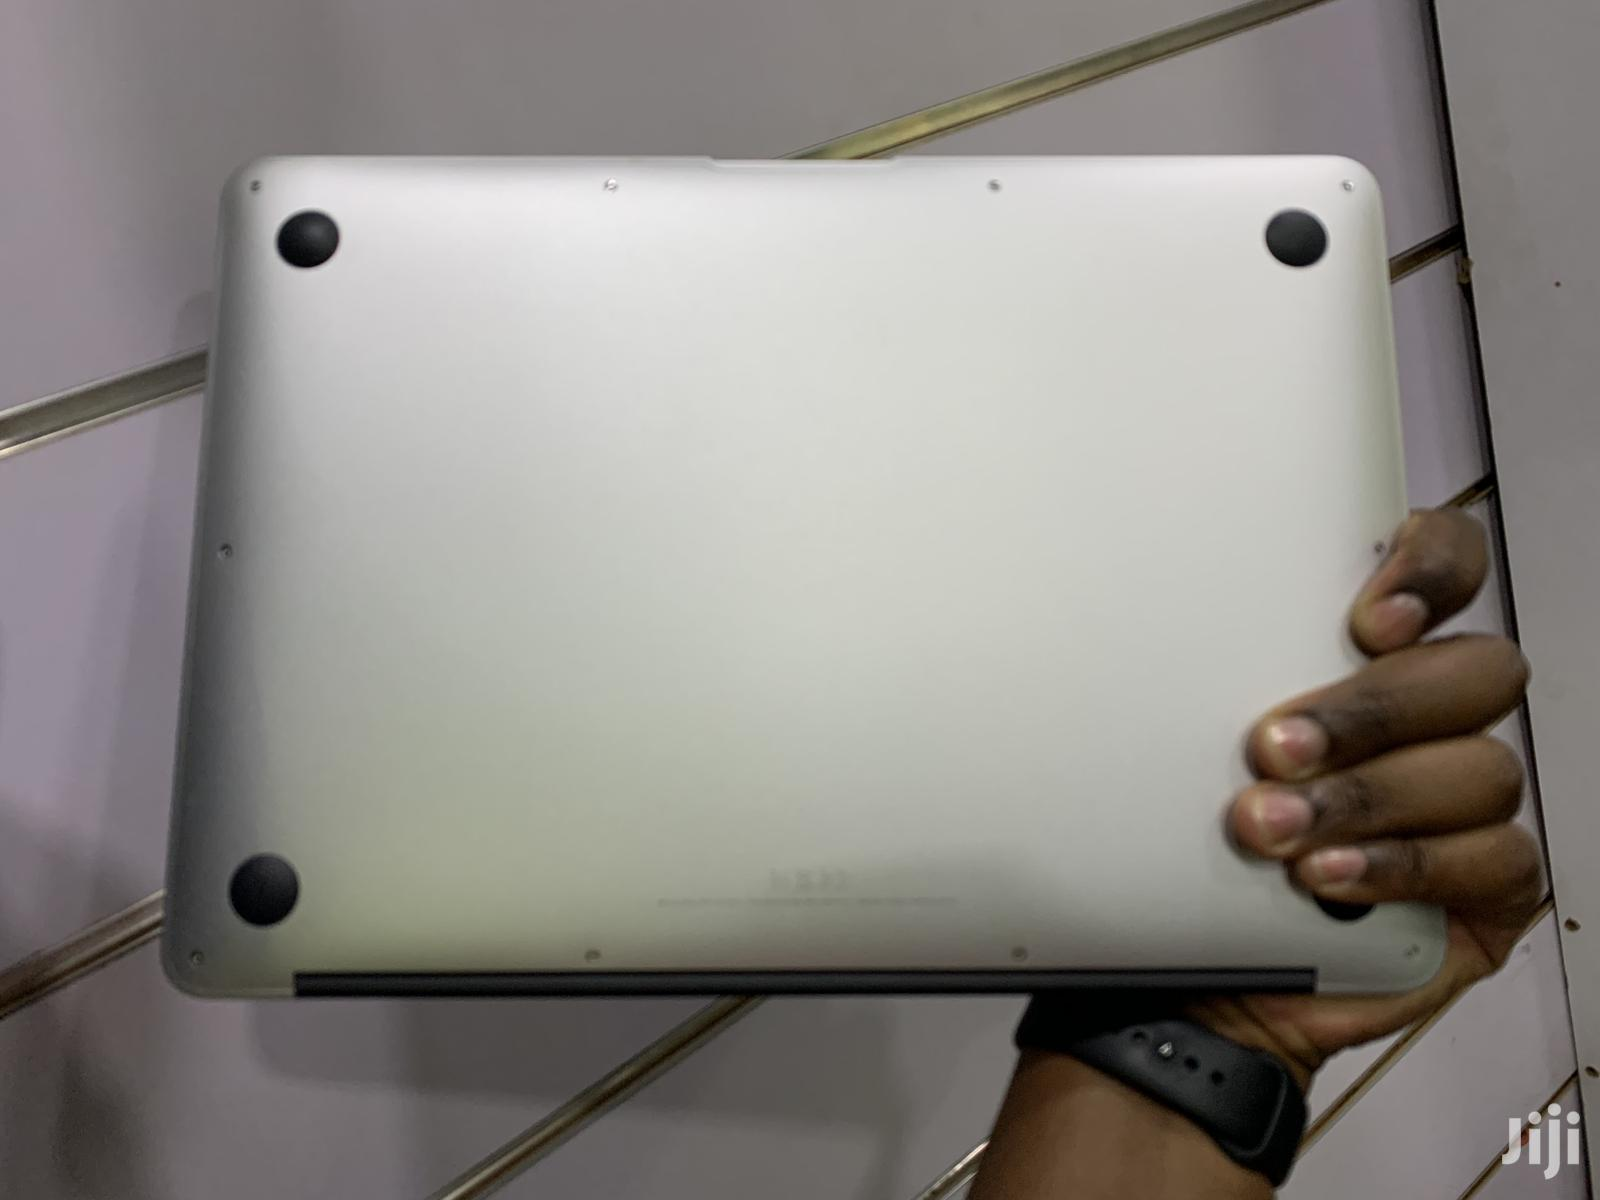 New Laptop Apple MacBook Air 8GB Intel Core i5 SSD 128GB | Laptops & Computers for sale in Kampala, Central Region, Uganda